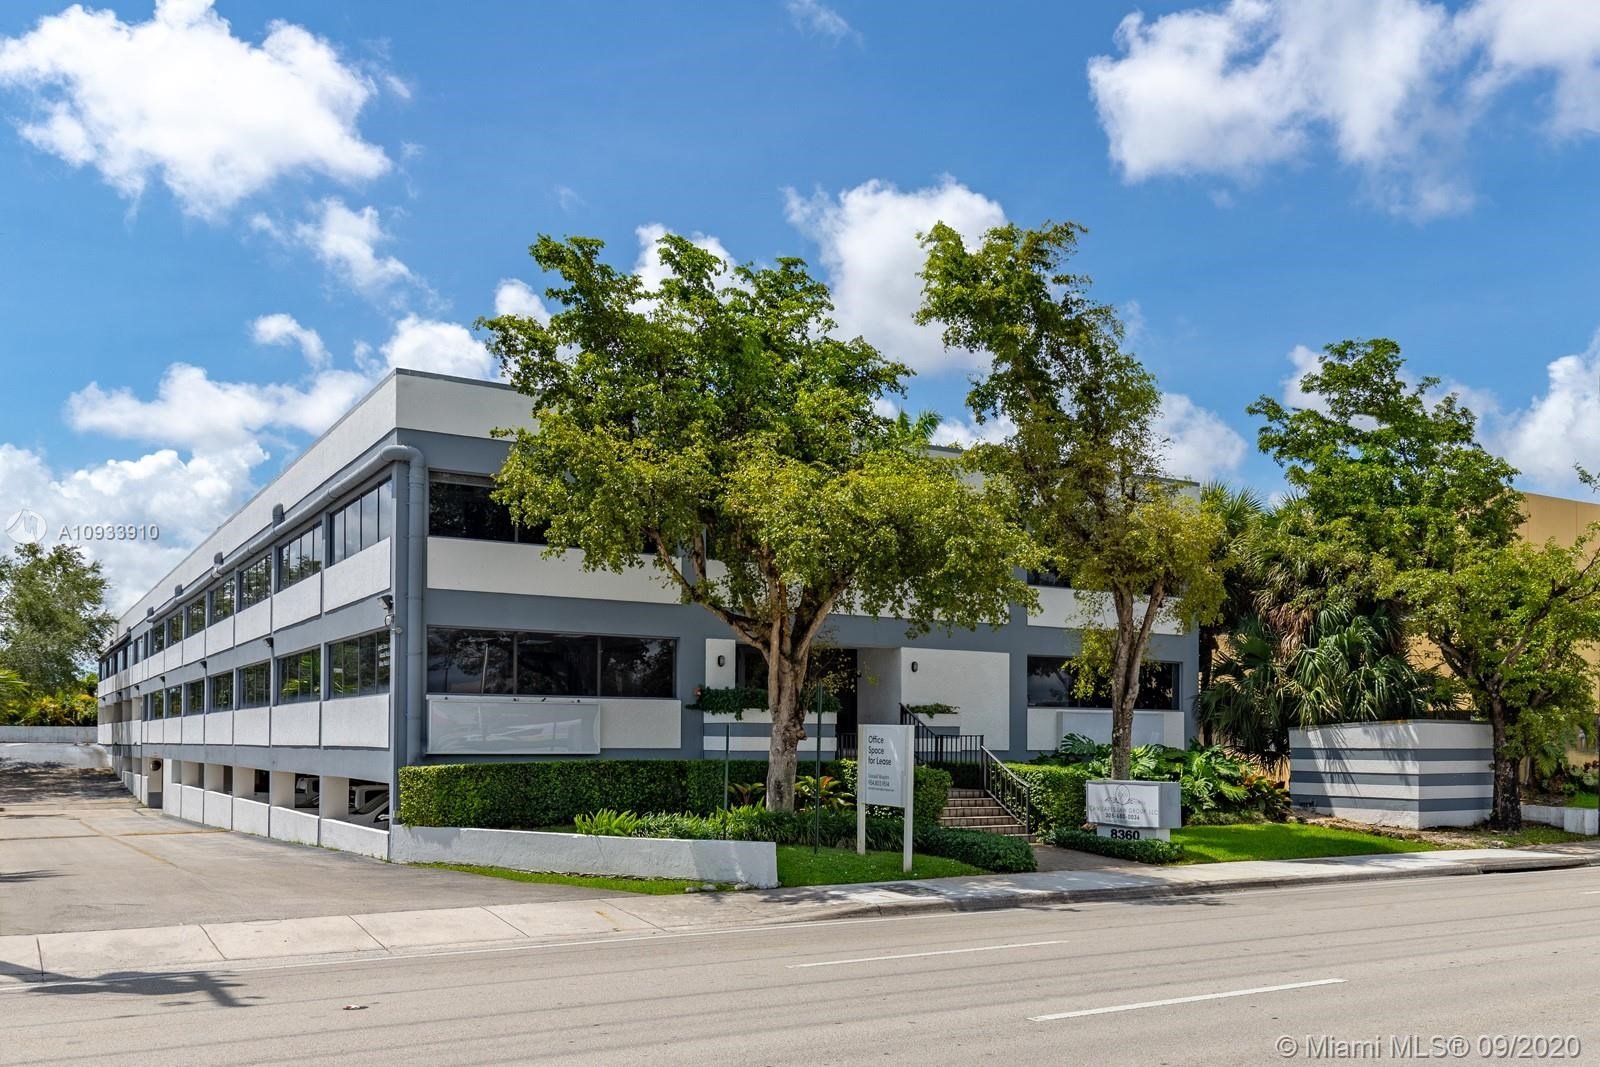 8360 W Flagler St, Miami, FL 33144